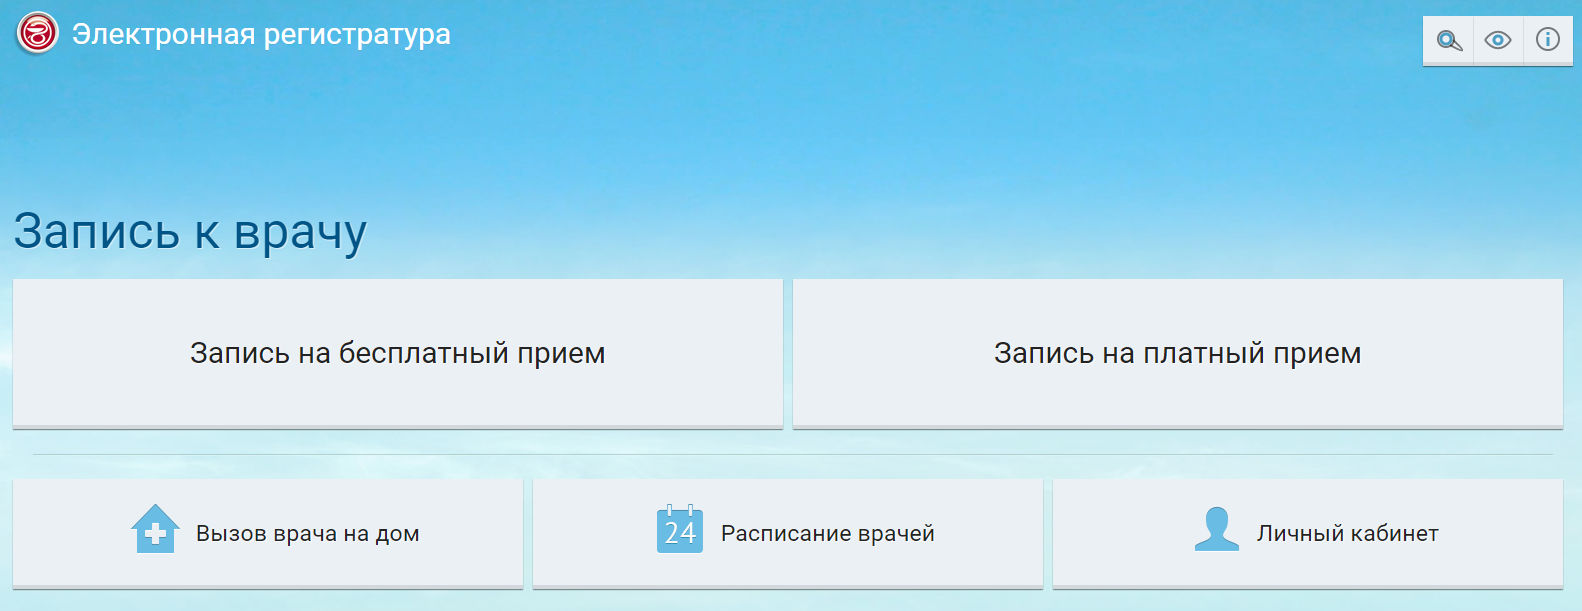 Электронная регистратура Балаково